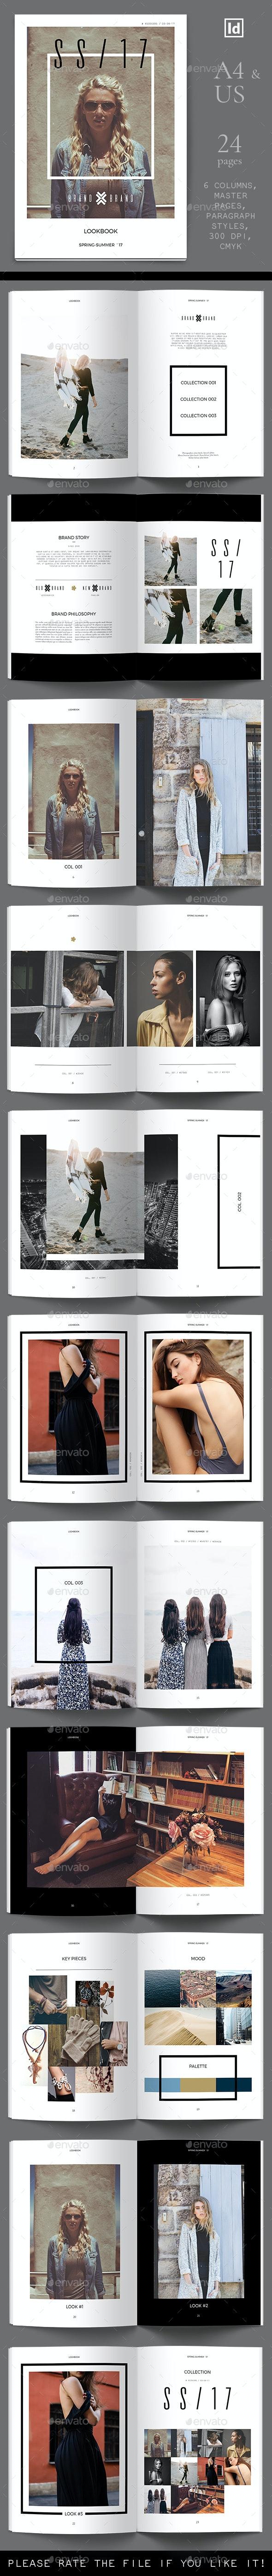 Lookbook 03 Template - Magazines Print Templates